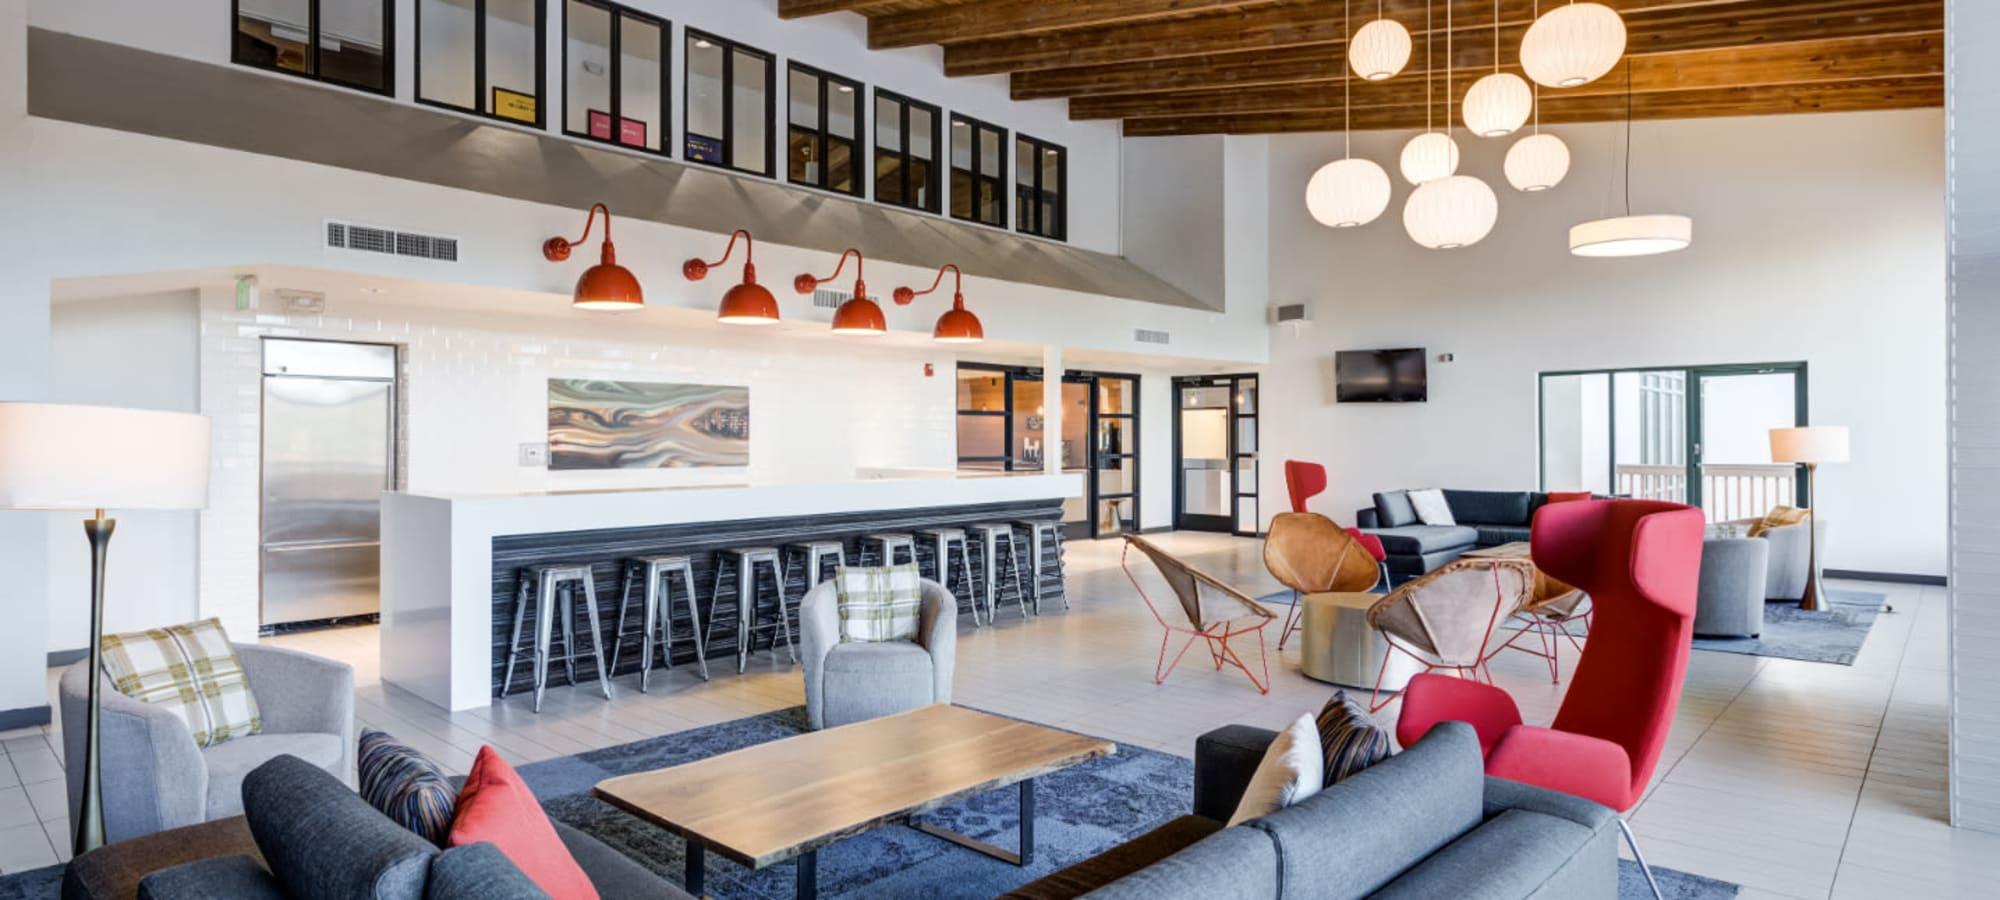 Apartments at Ashford Belmar in Lakewood, Colorado